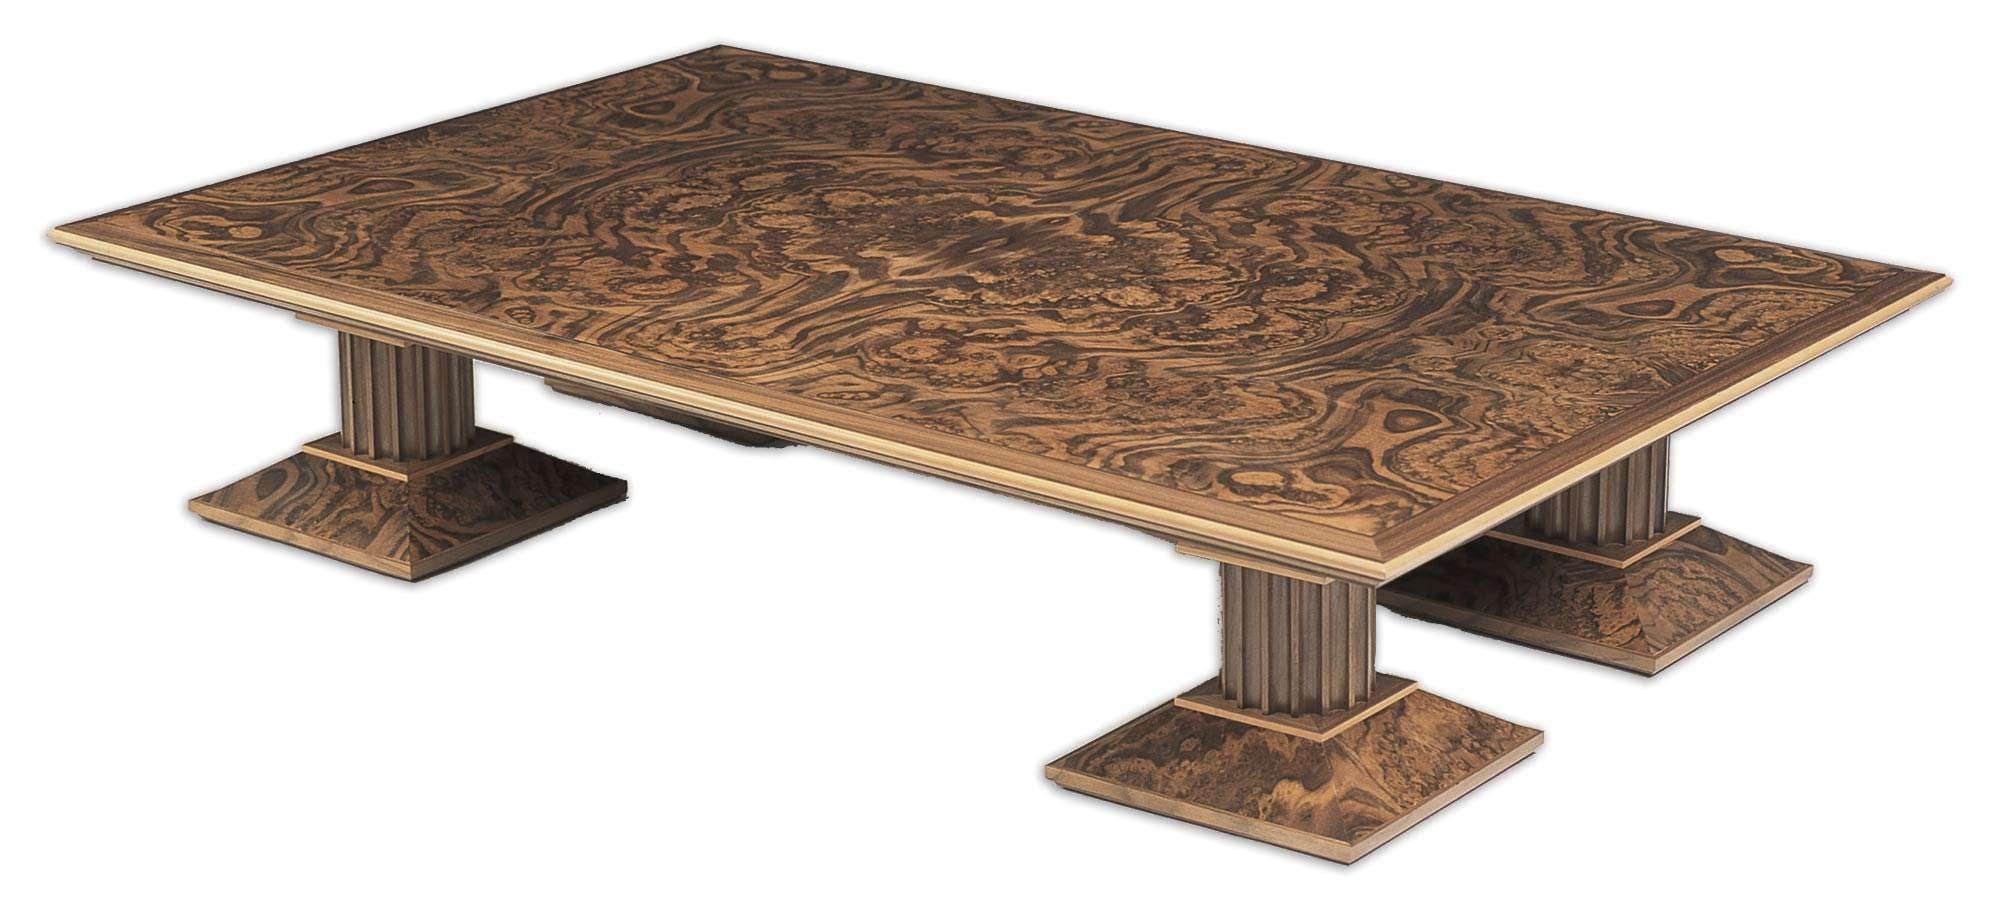 Bespoke Coffee Table In Walnut (View 2 of 20)